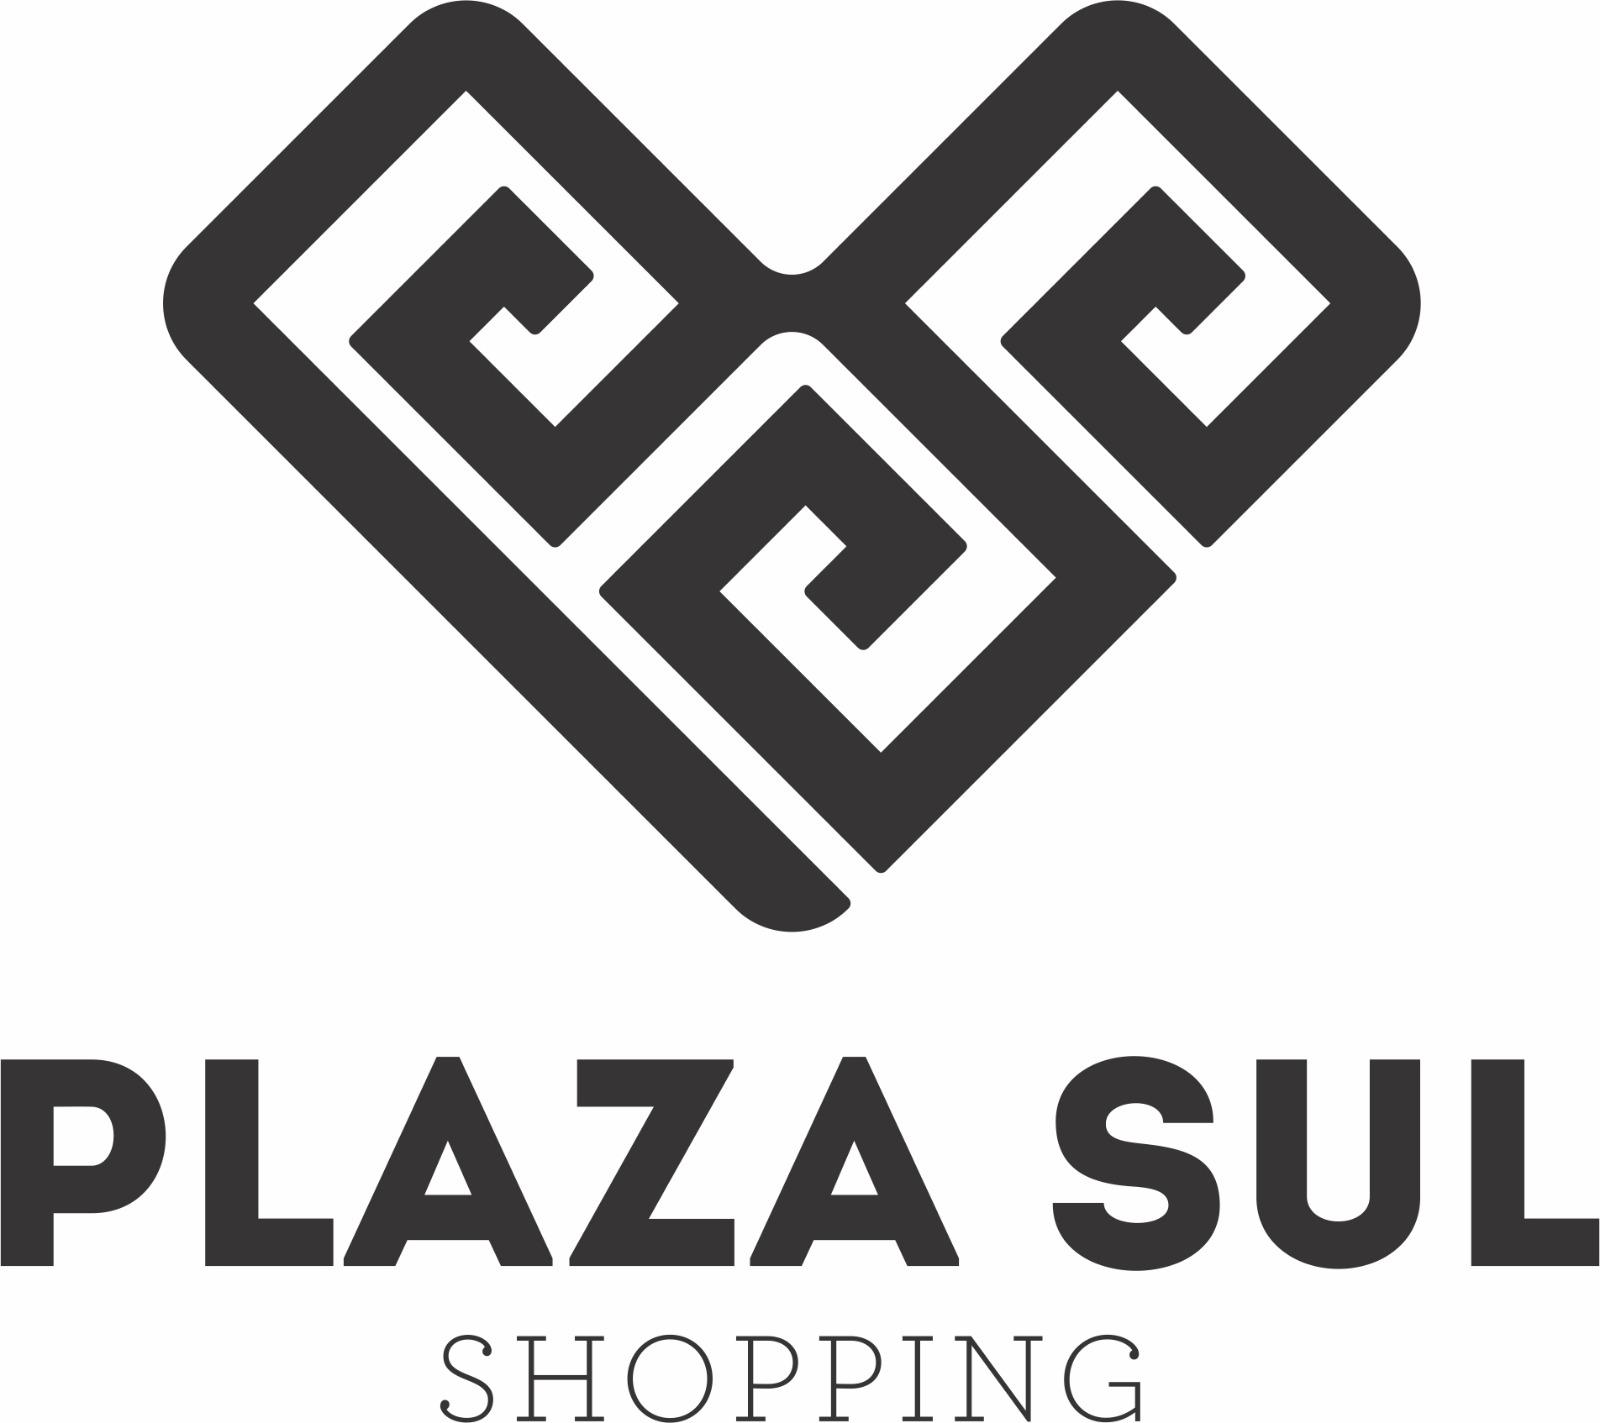 f21c1bbcd Plaza Sul Shopping apresenta novo logo e identidade visual - Jornal São  Paulo Zona Sul